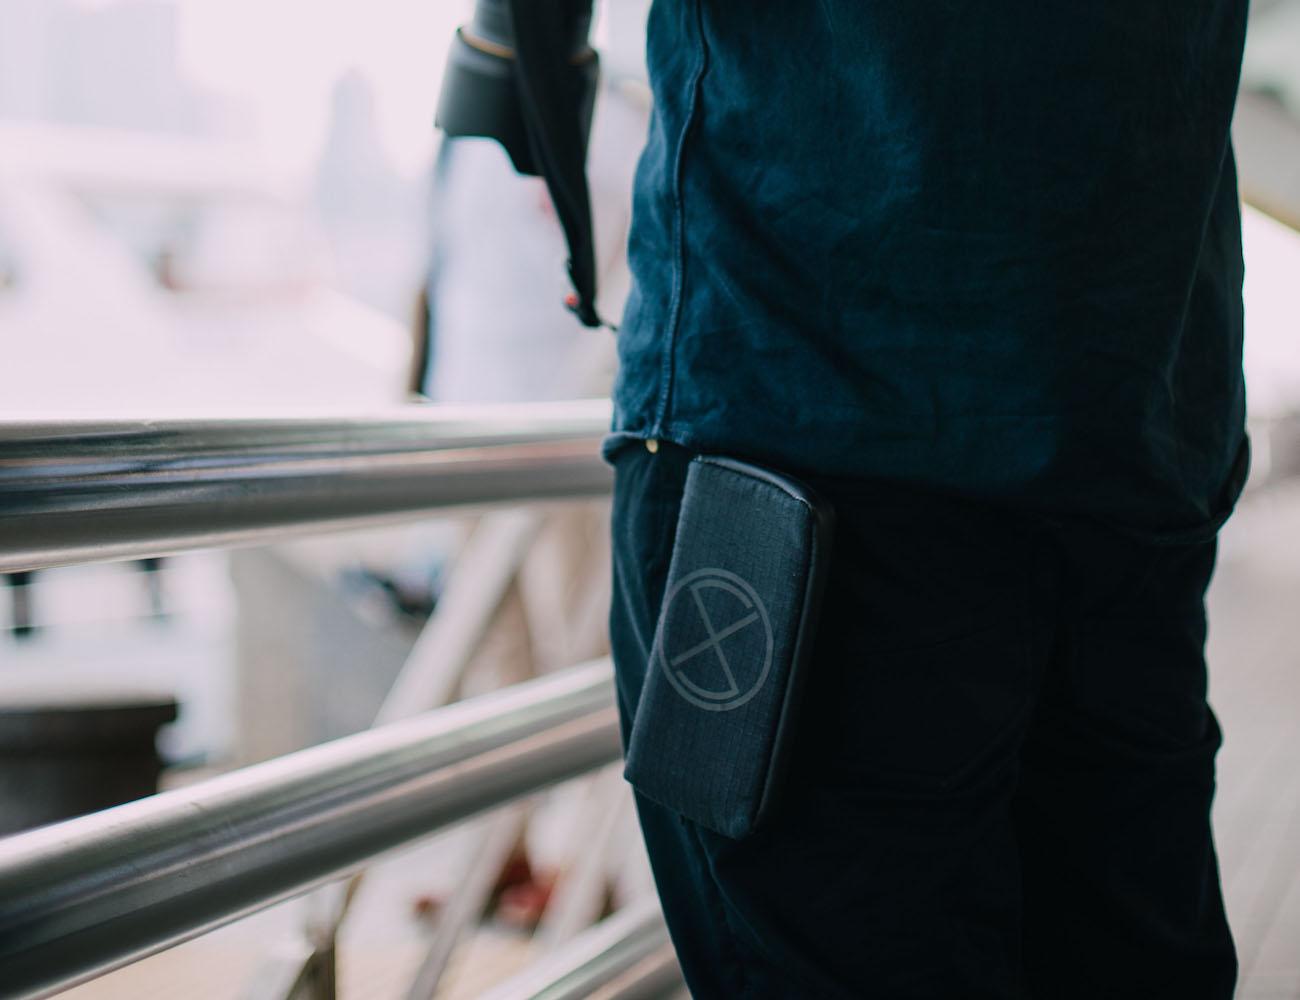 EXPLOSHIELD Smartphone Battery Bomb Suit